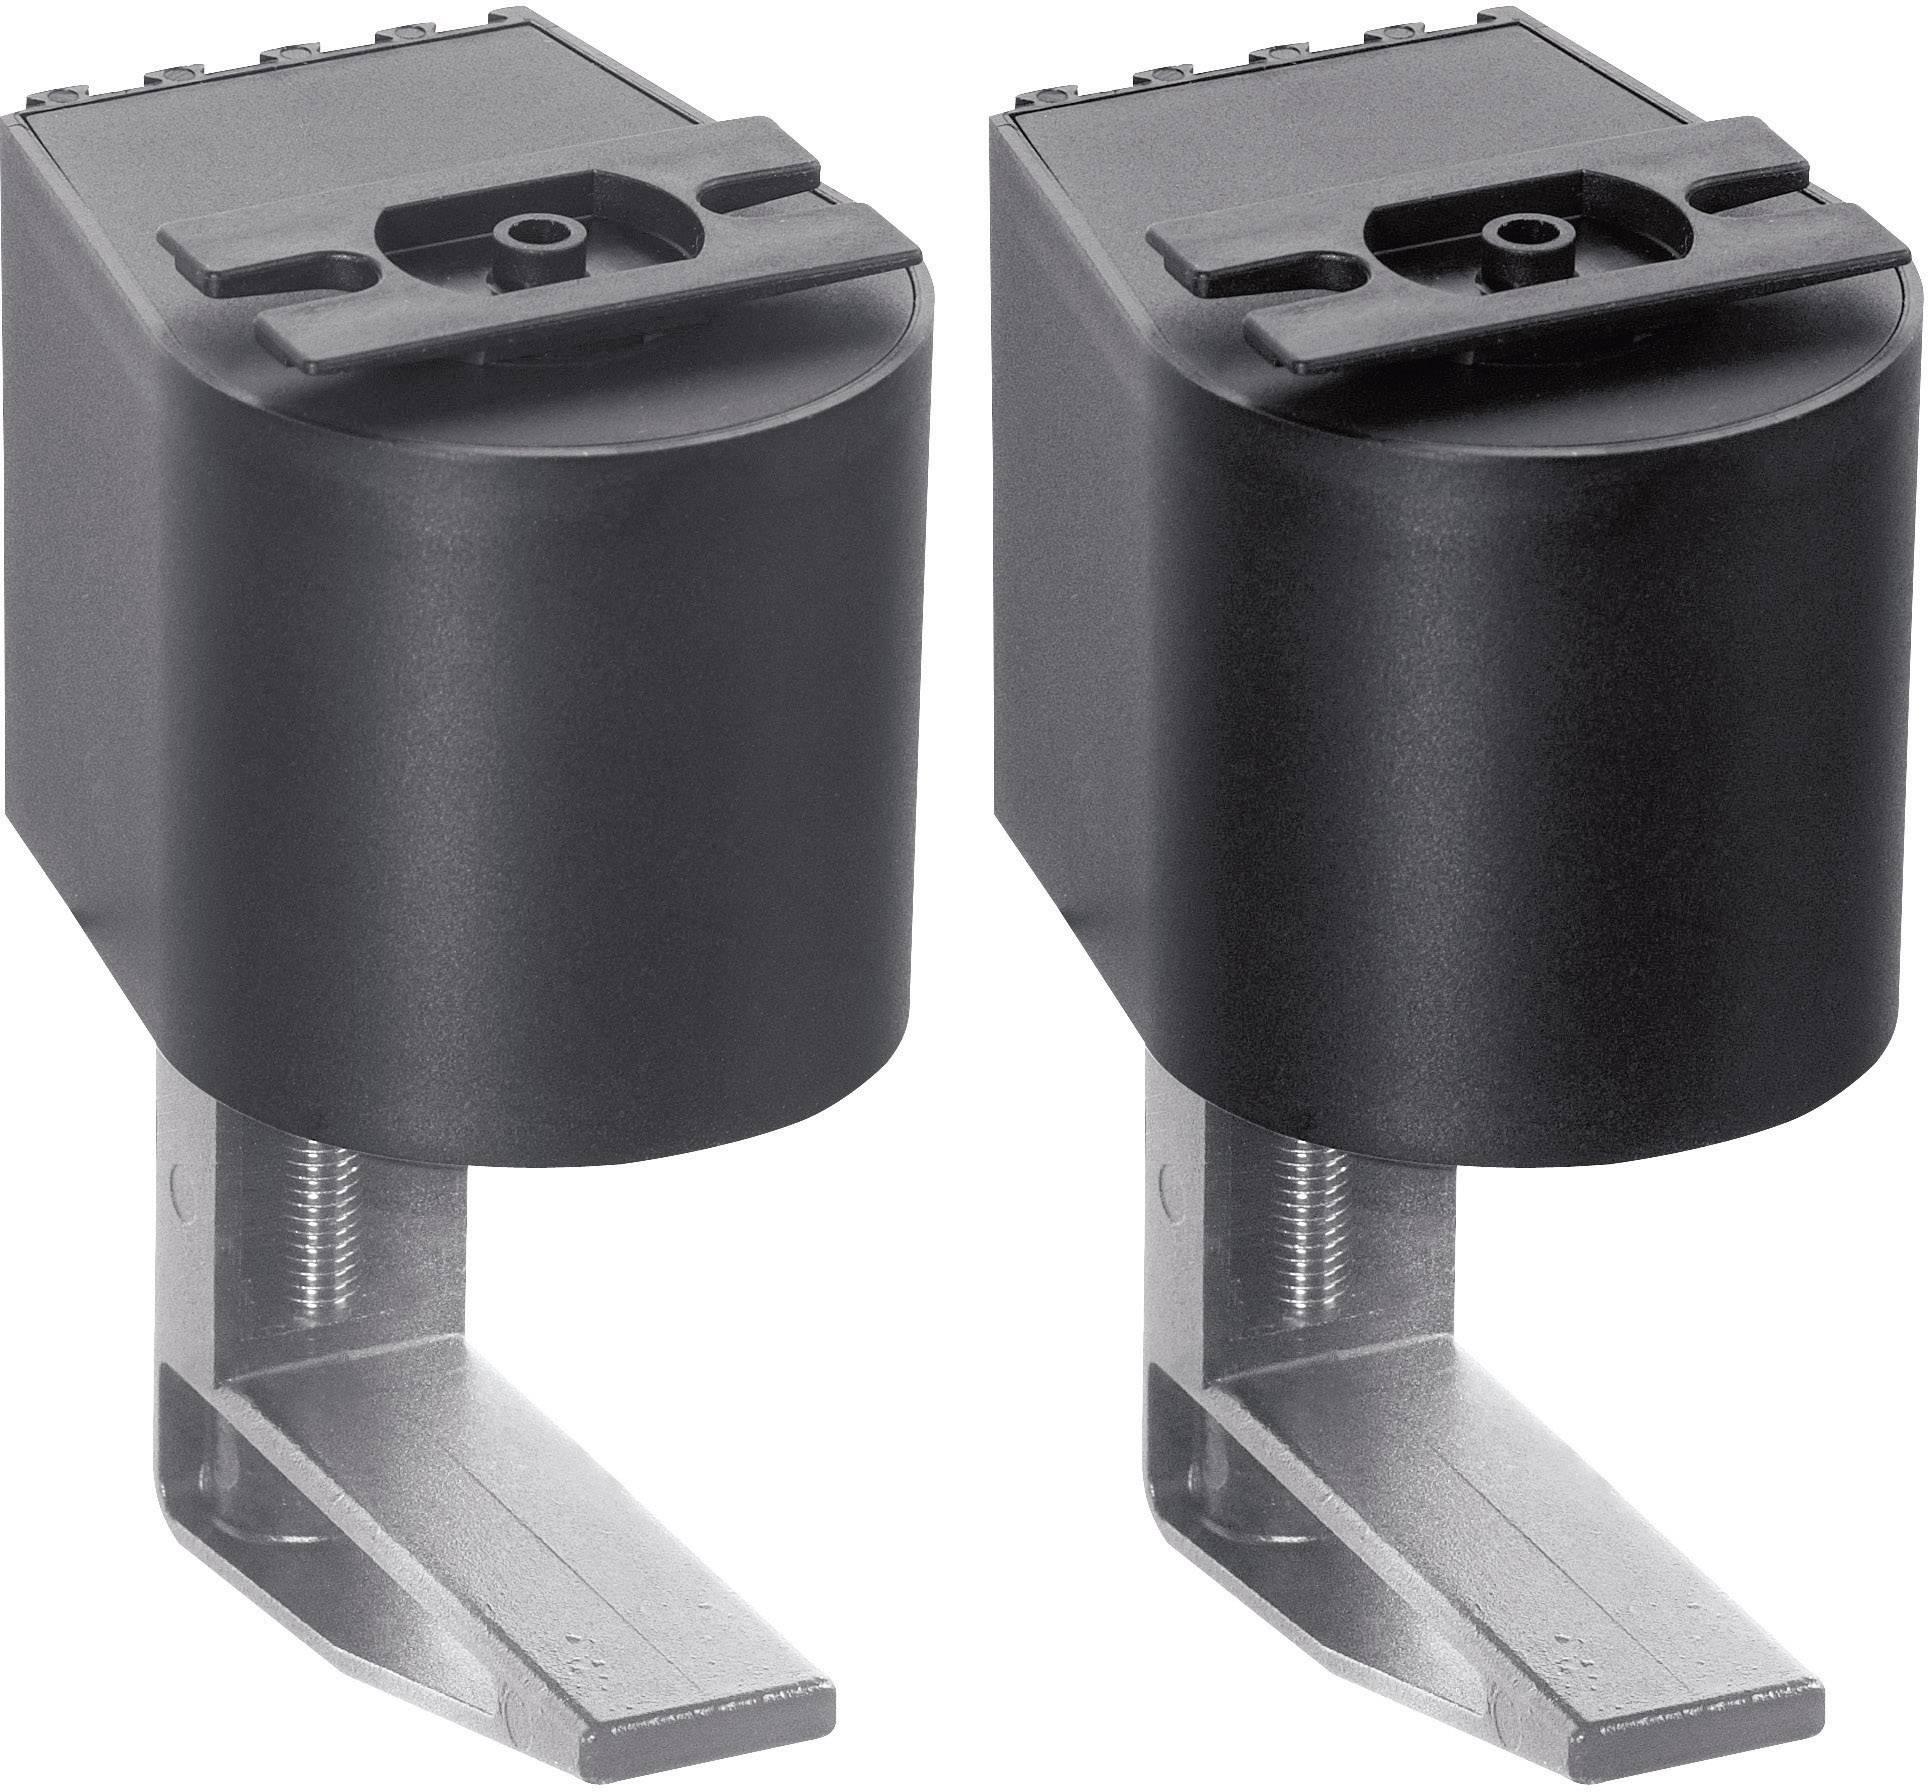 Montážní úchytka Schulte Elektrotechnik, 99090210, 40-75 mm, sada 2 ks, černá